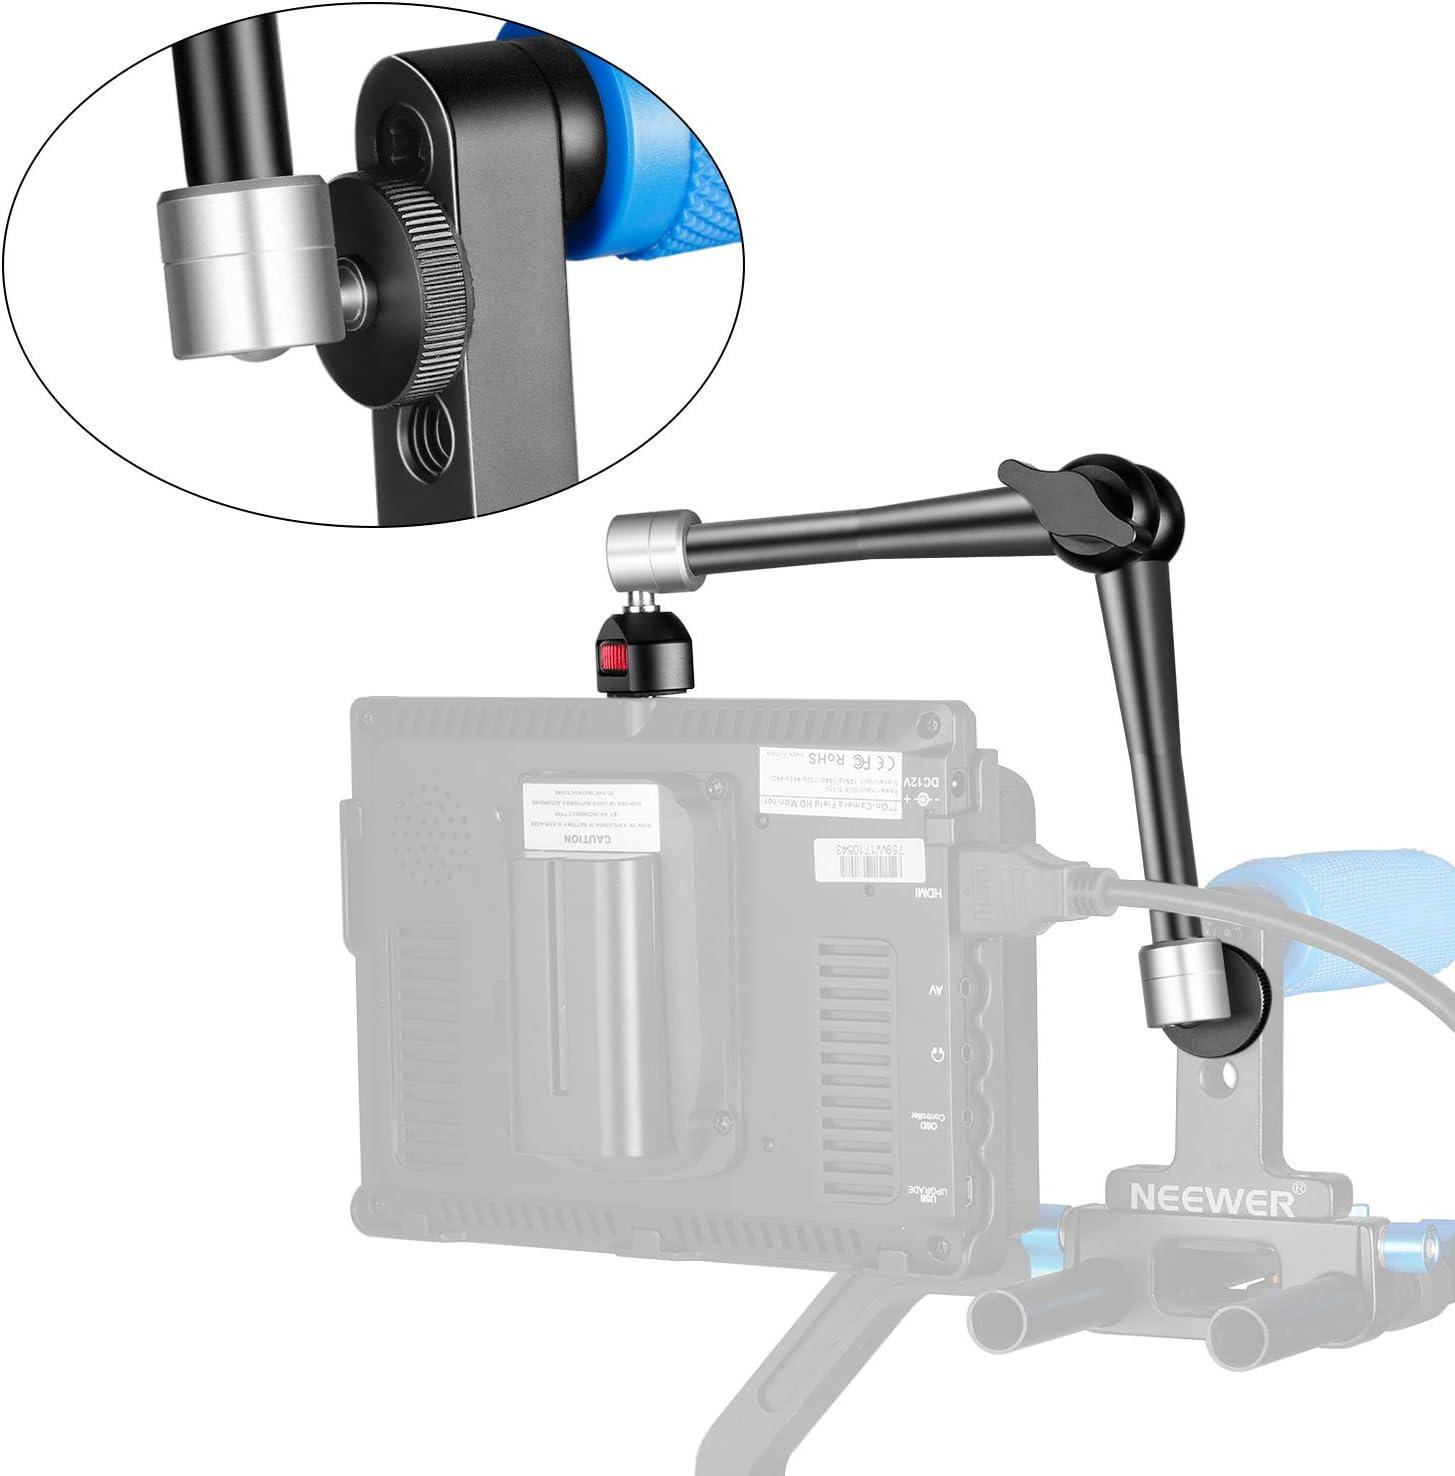 Neewer Kameraarm Artikulieren Magic Arm Stativ 7 Zoll//3-Arm